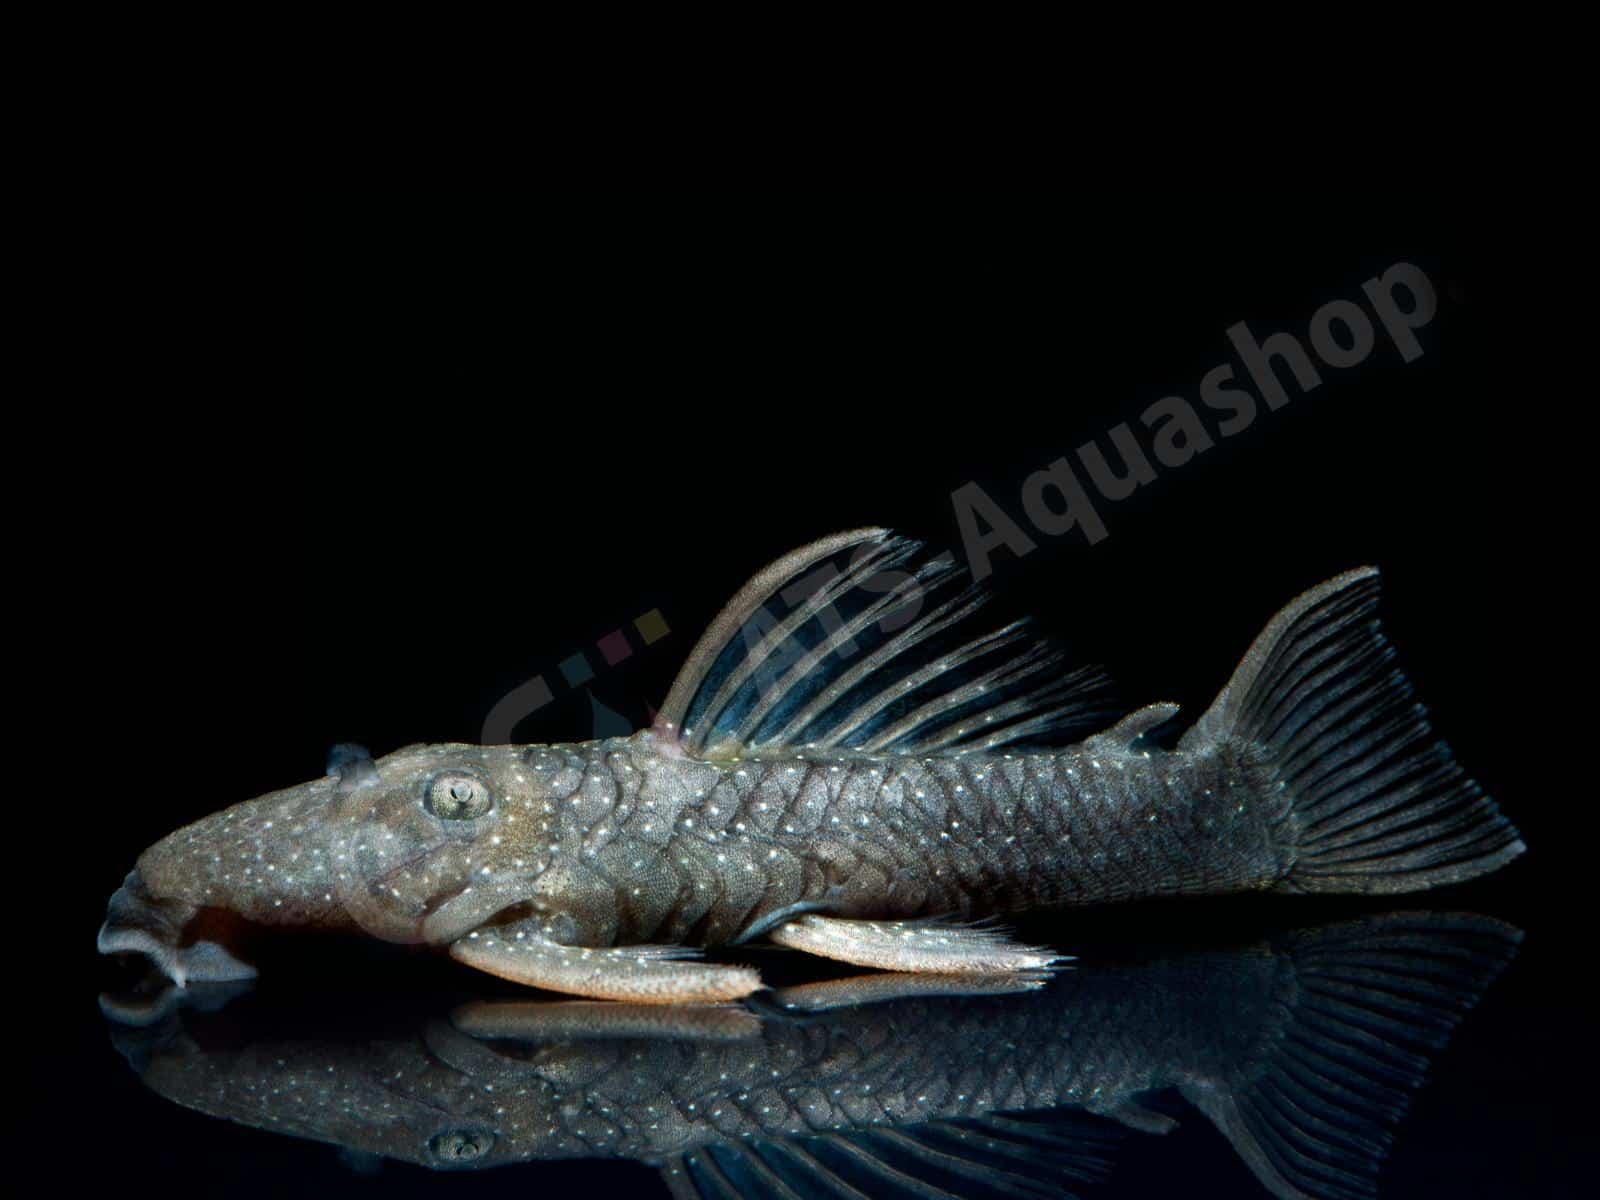 spectrancistrus murinus enrico richter 0292 7